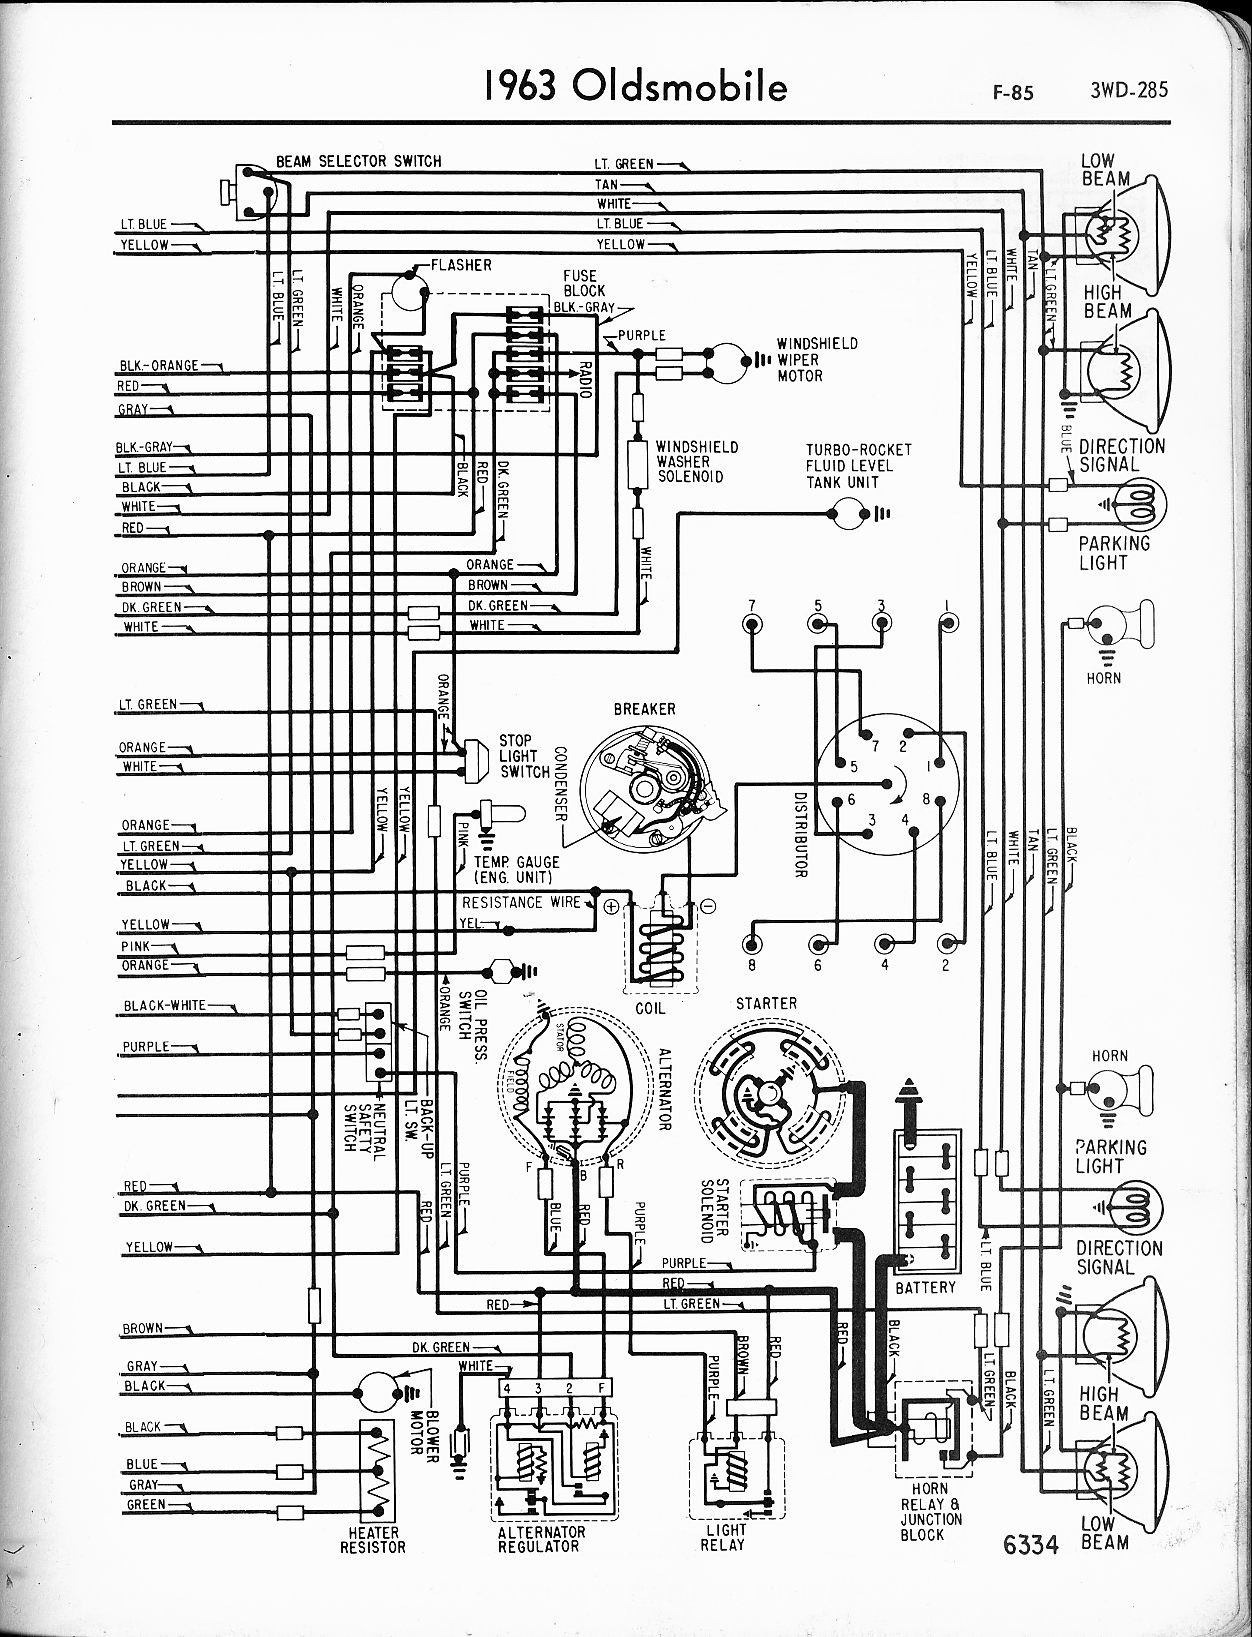 1993 gmc sonoma radio wiring diagram er for hospital management 1994 oldsmobile cutl ciera